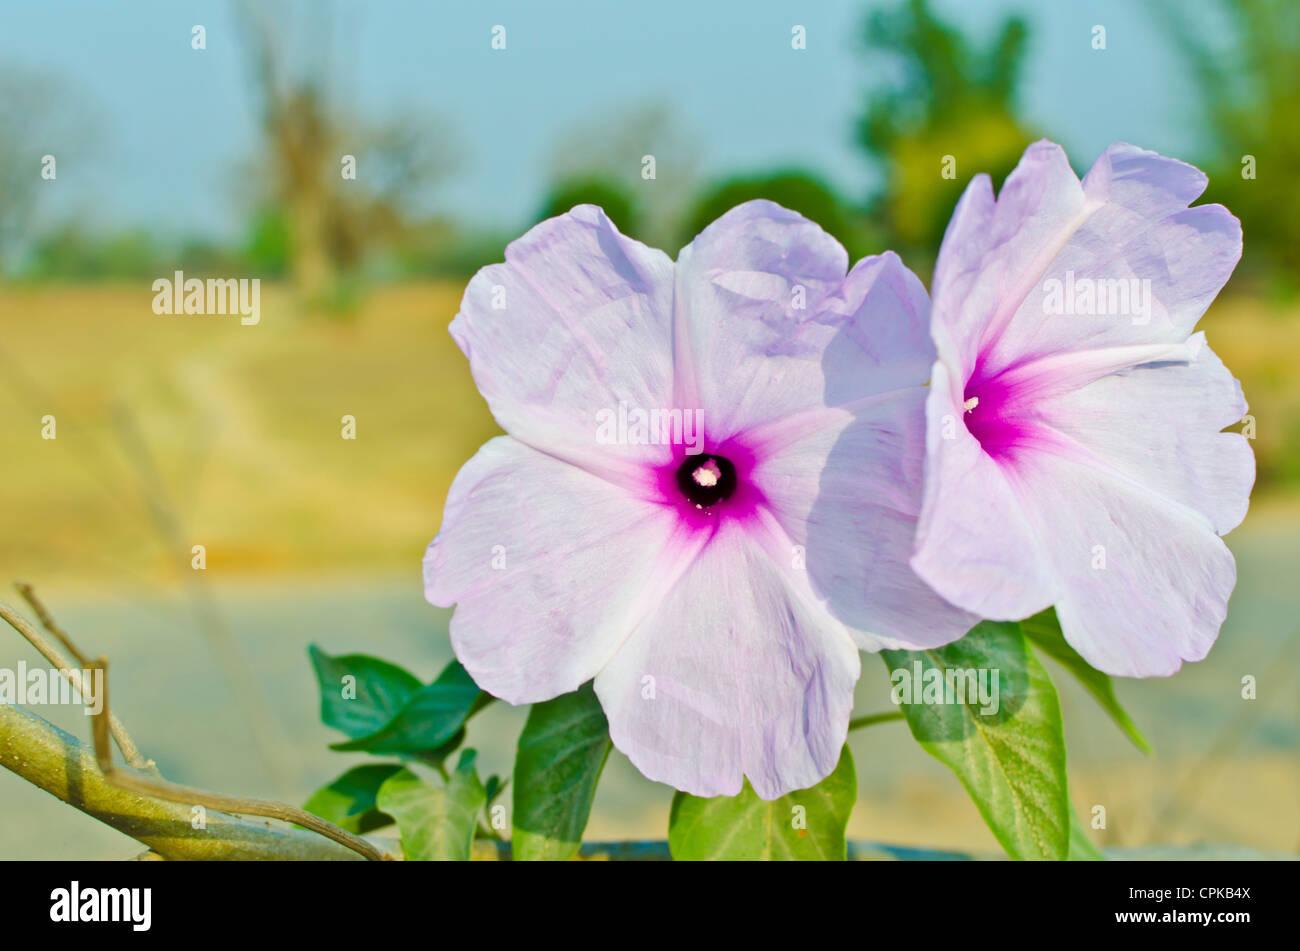 Flowers of pink morning glory / ipomoea carnea / ipomoea fistulosa.of Convolvulaceae family - Stock Image